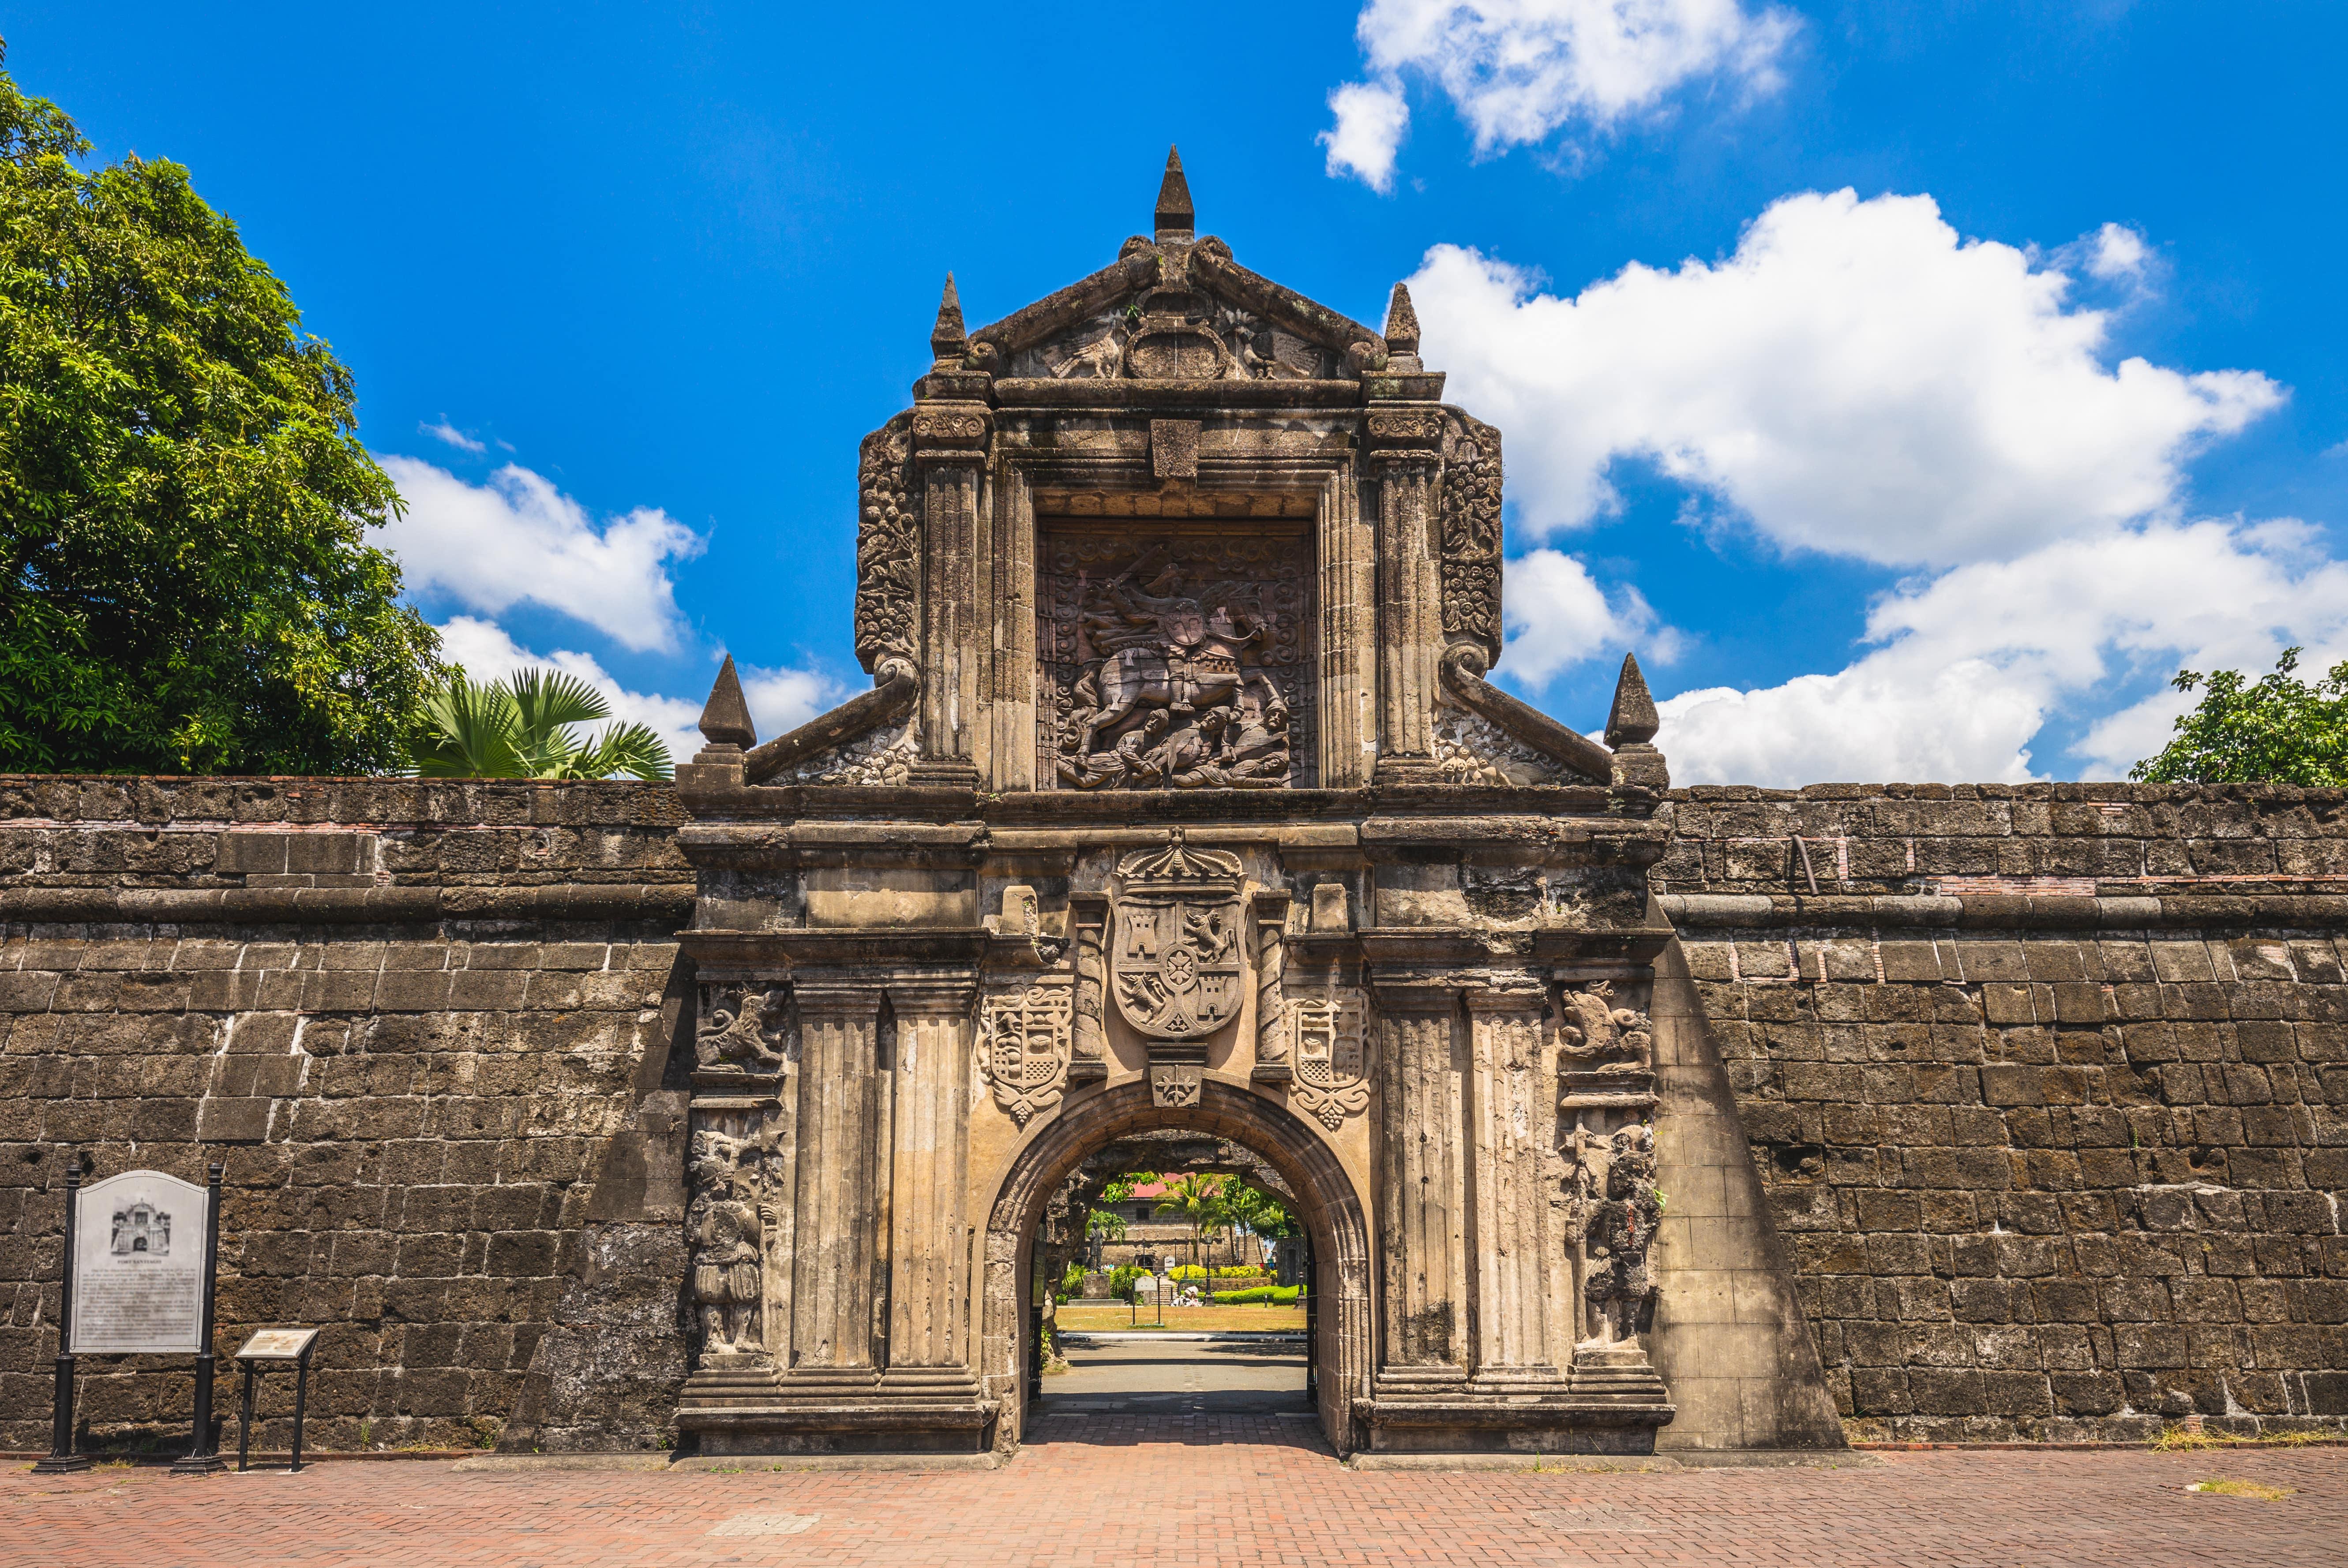 A citadel called Fort Santiago in Intramuros